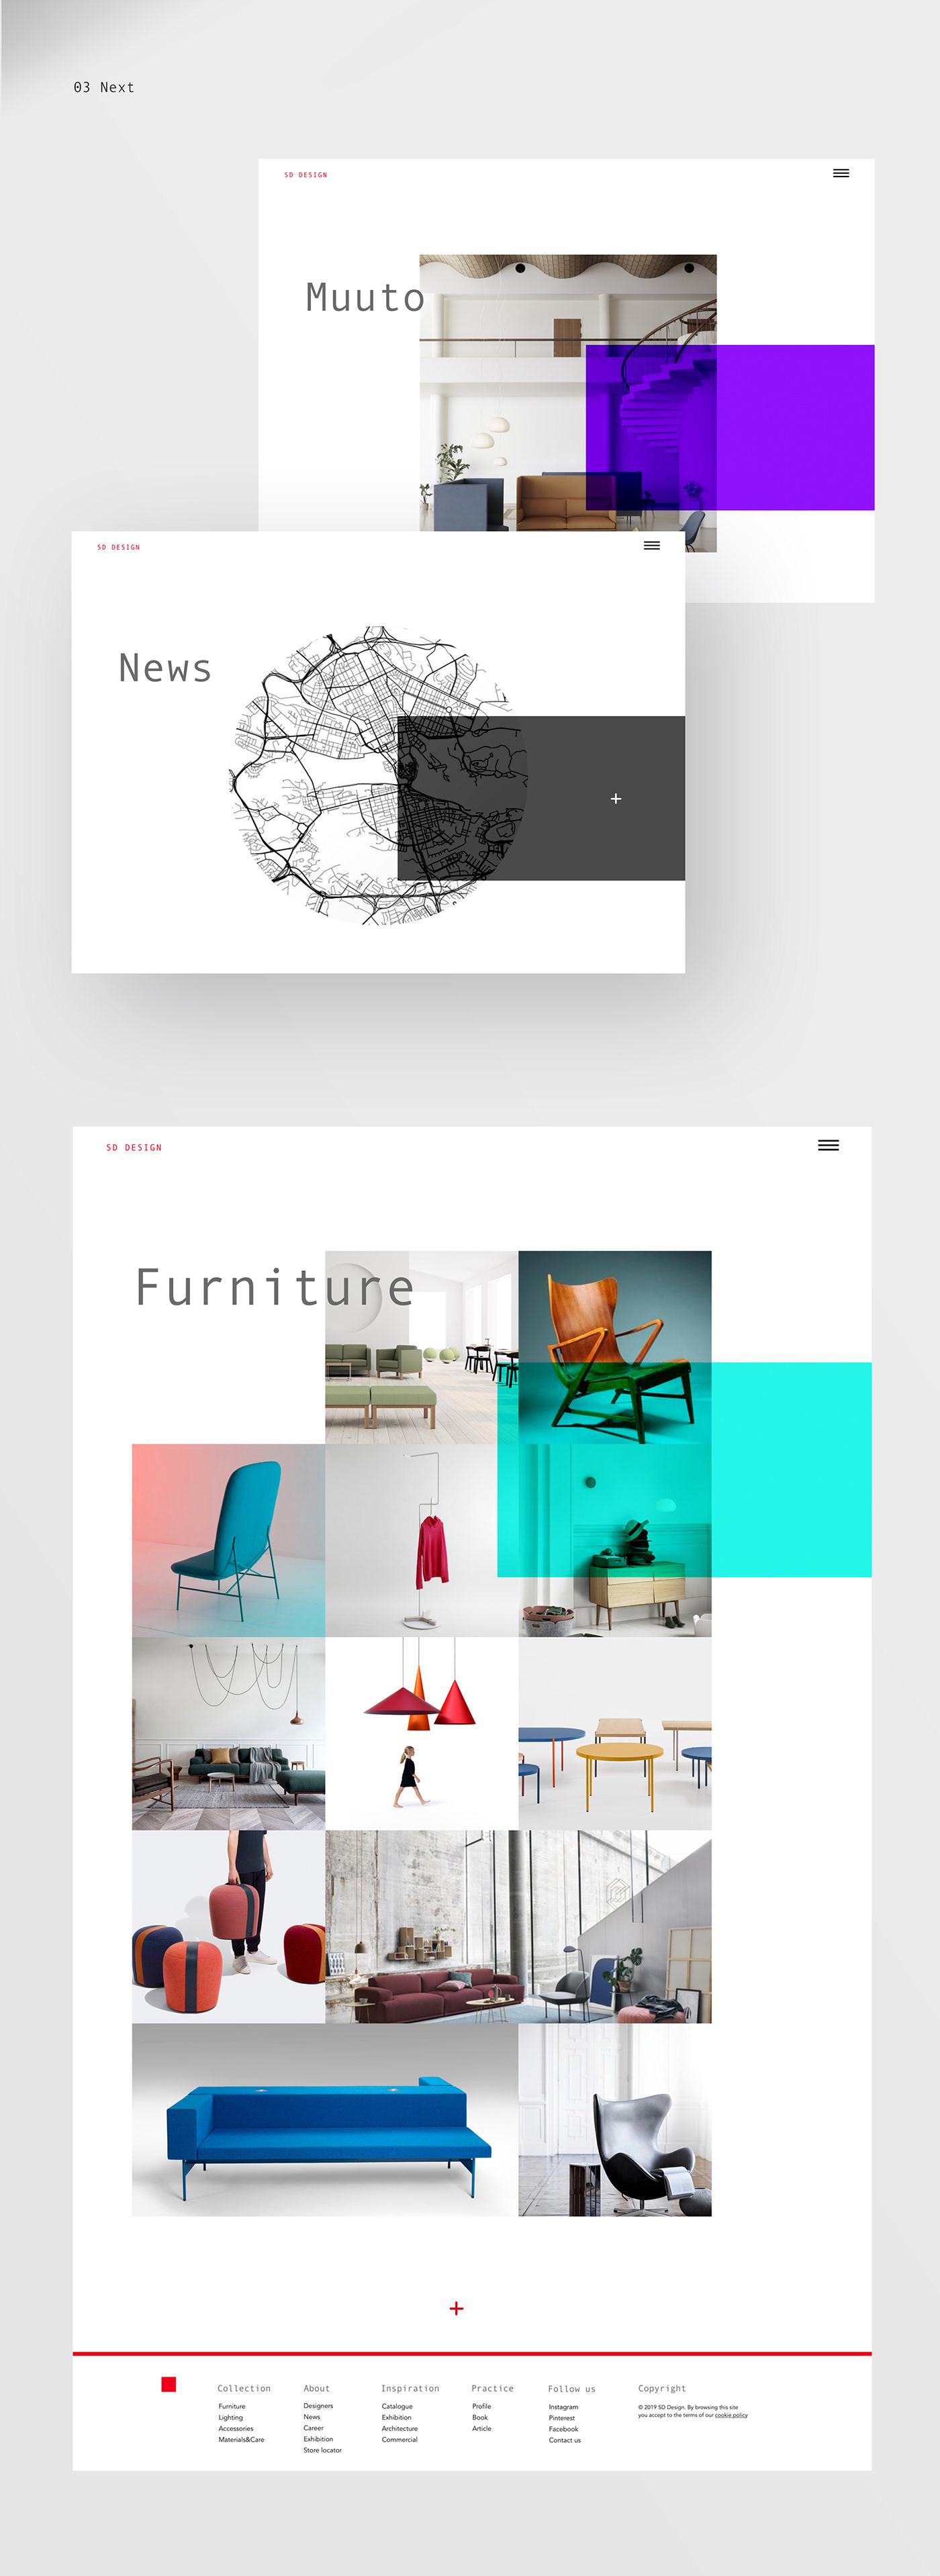 Web Website colors landing landing page Interface UI interaction UI/UX Design interface design